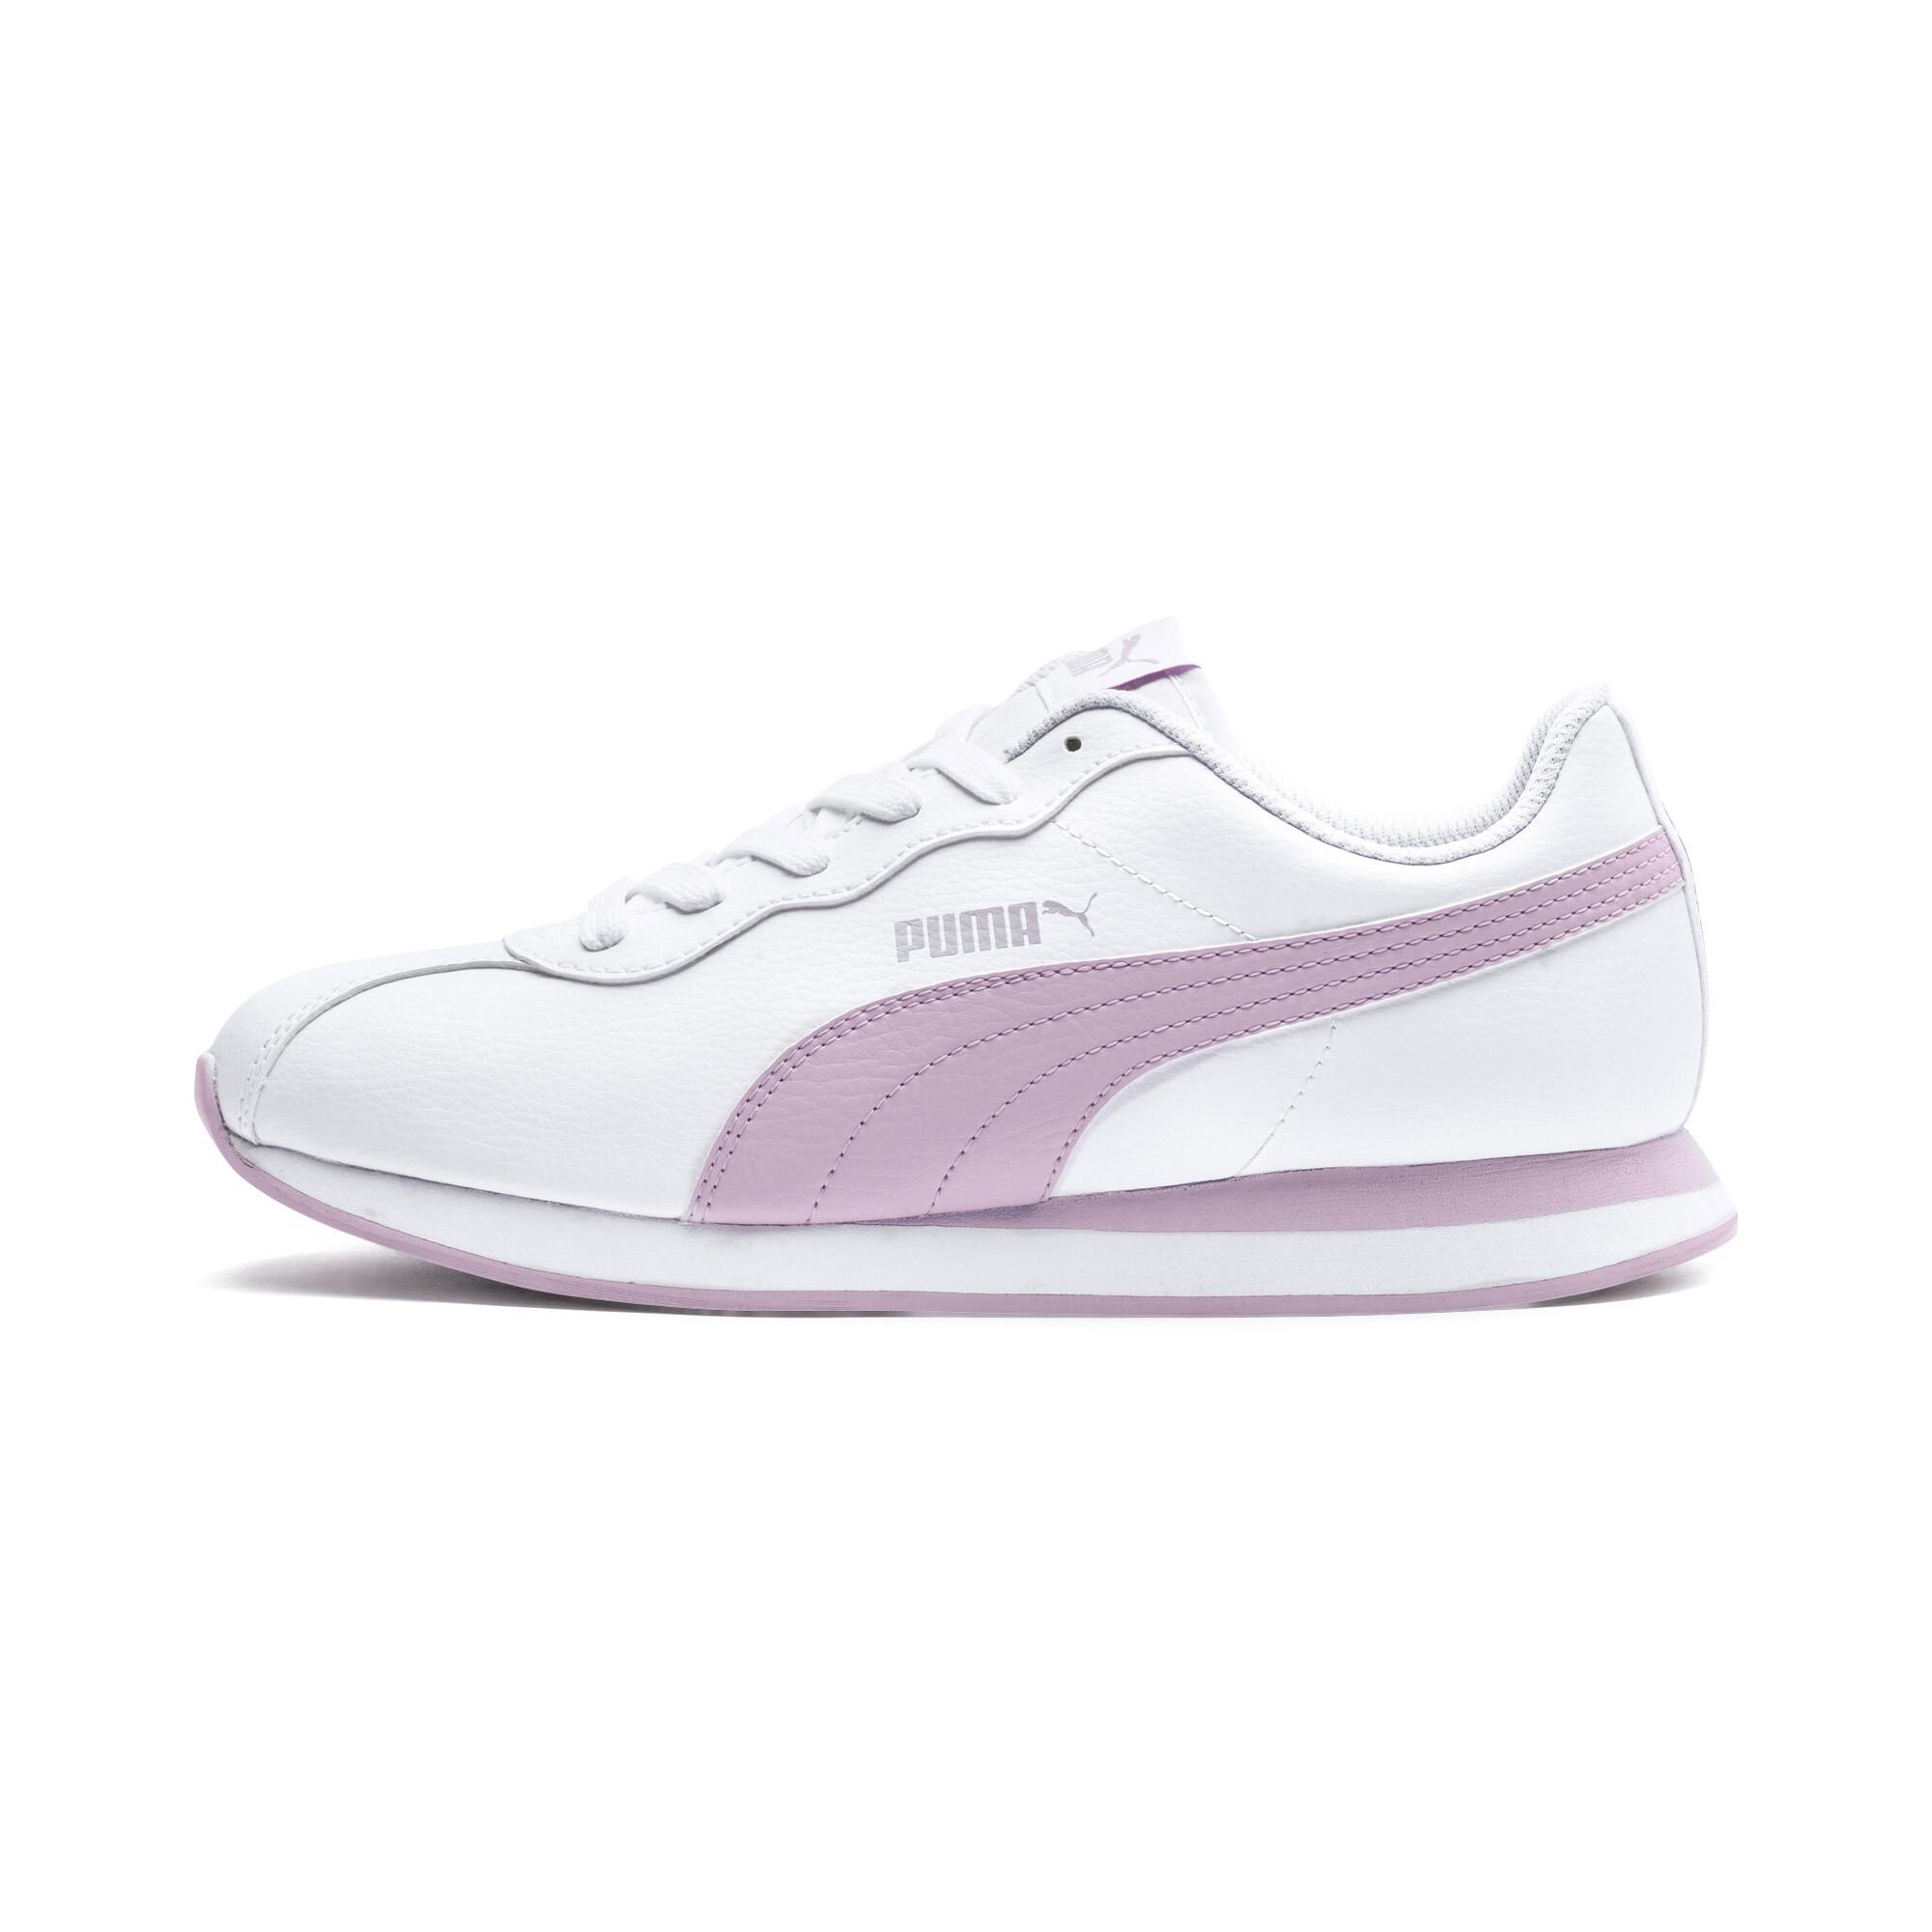 PUMA-Men-039-s-Turin-II-Sneakers thumbnail 21